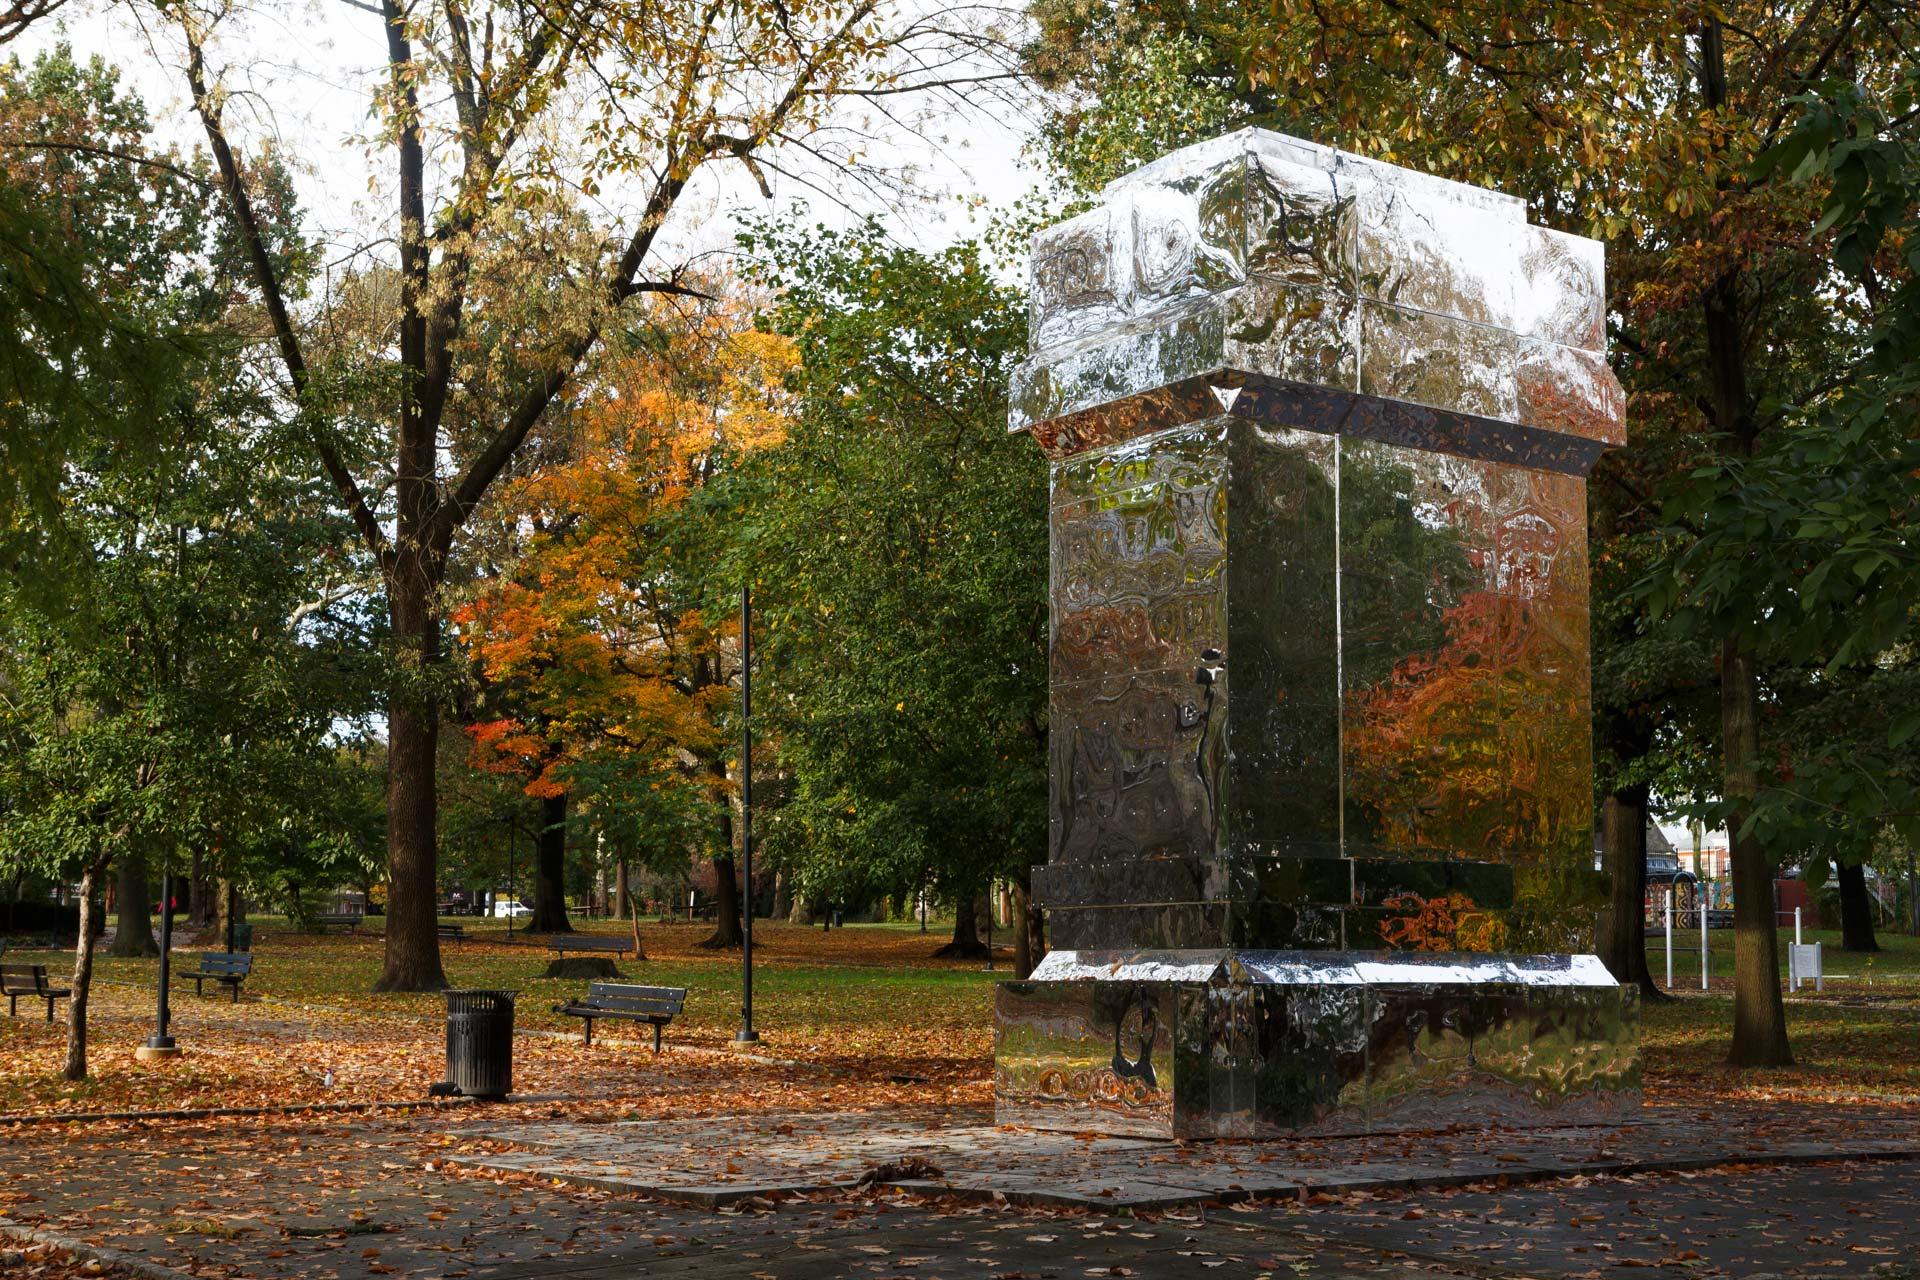 The Battle Is Joined  Karyn Olivier Born in 1968 • Trinidadian and American • Based in Philadelphia Acrylic mirror, wood, screws, and adhesive Vernon Park   Photo: Steve Weinik/Mural Arts Philadelphia